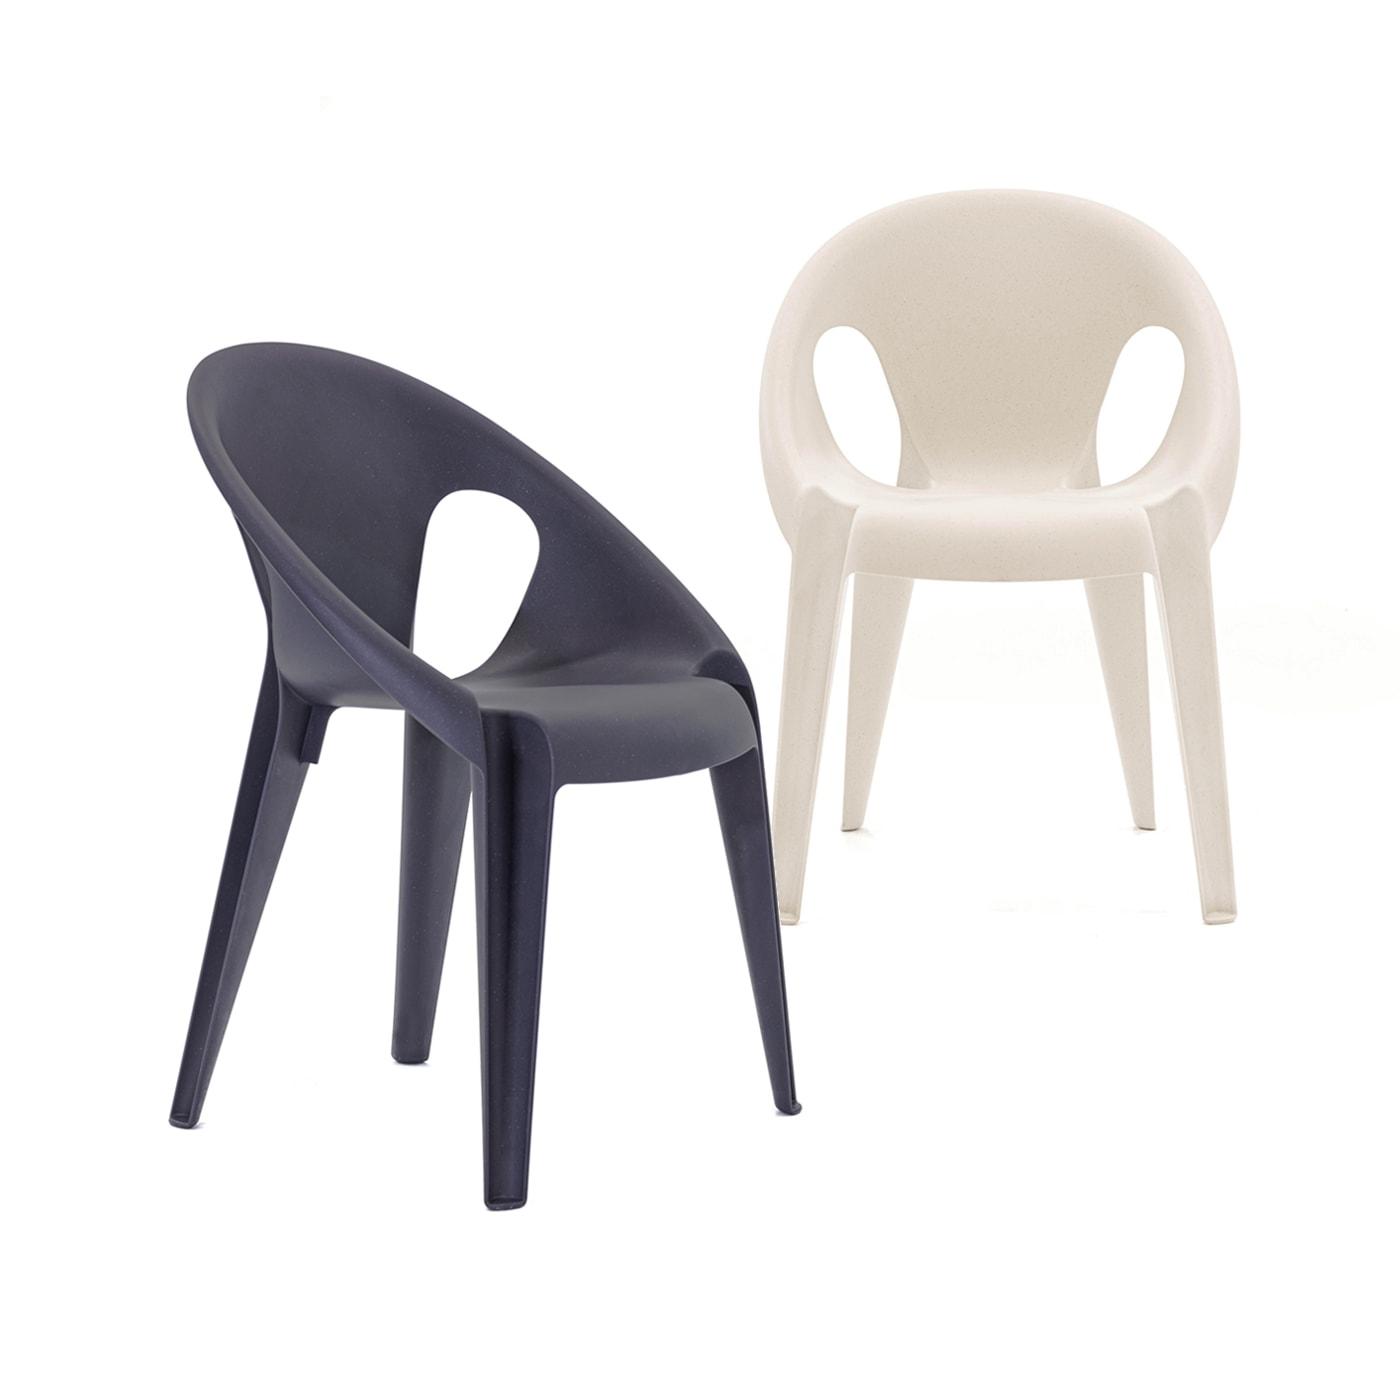 MAGIS Bell Chair Sedia impilabile materiale riciclato - vendita onlline